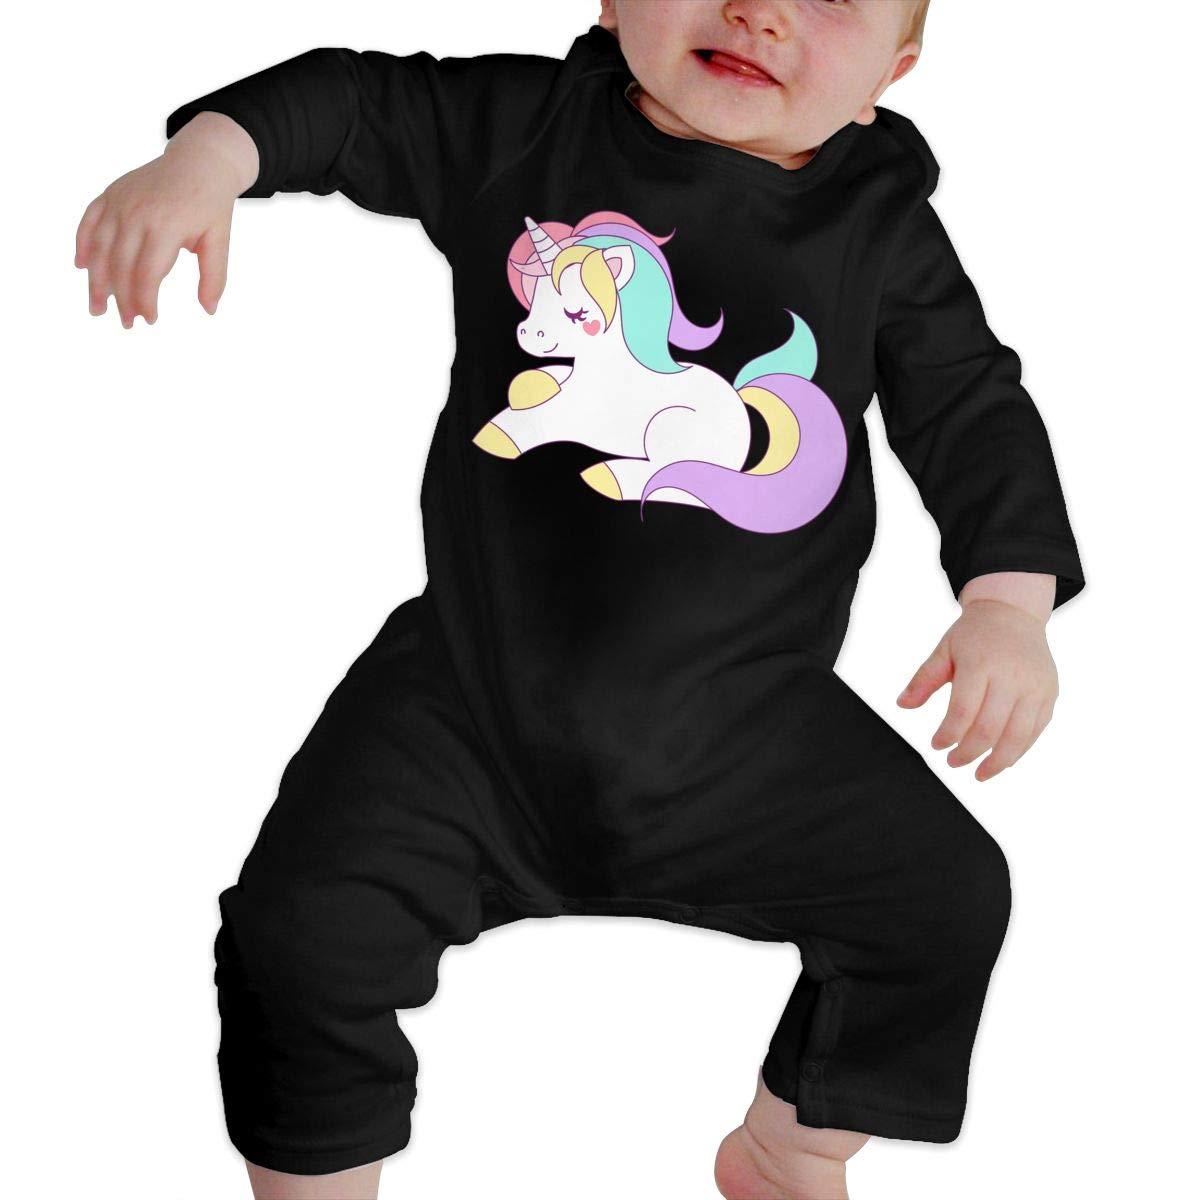 KAYERDELLE Unicorns Long Sleeve Unisex Baby Bodysuits for 6-24 Months Toddler